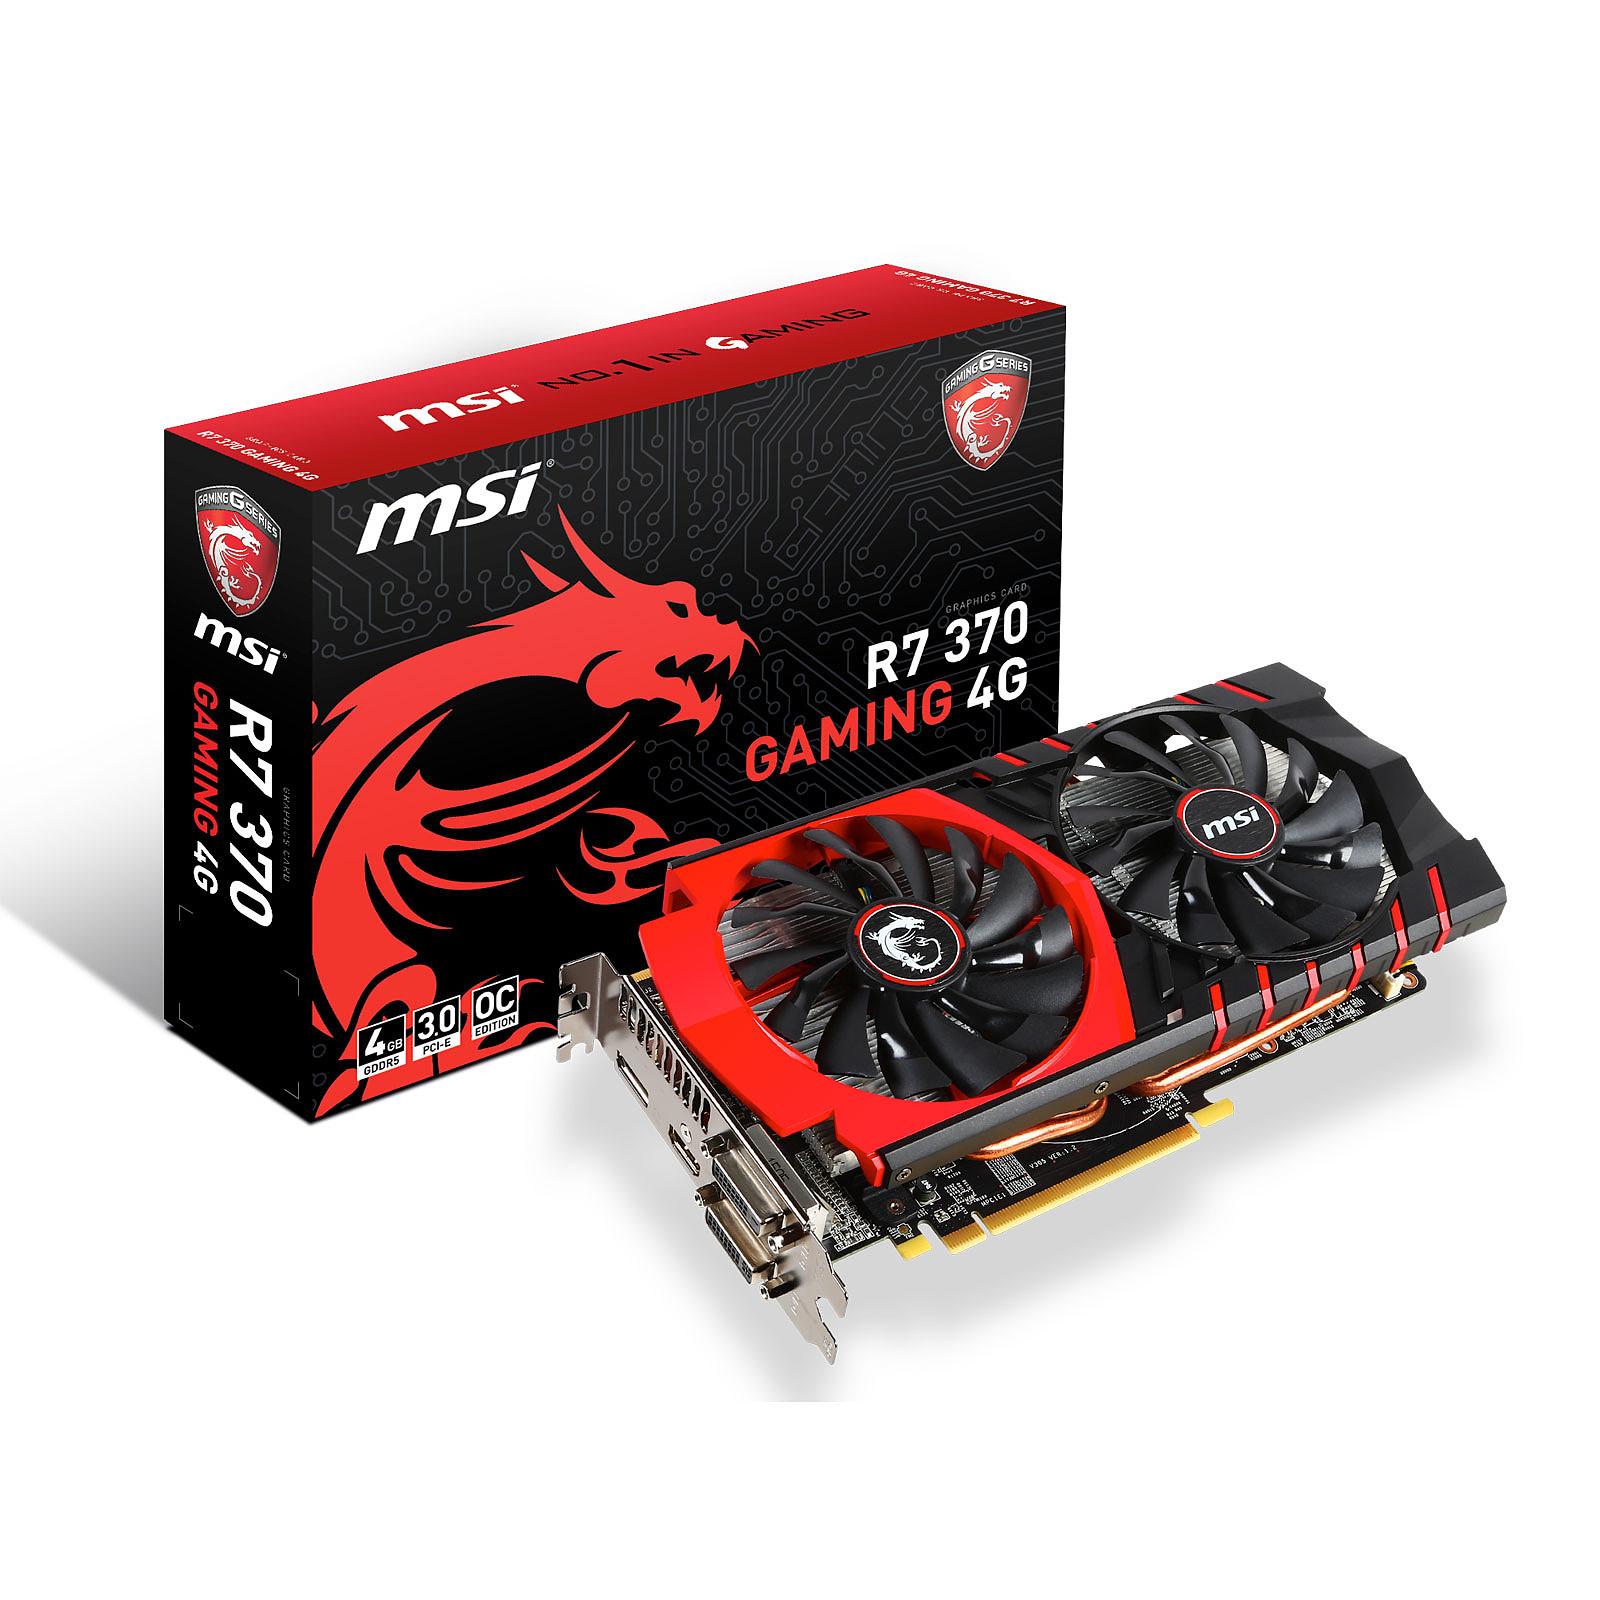 MSI Radeon R7 370 GAMING 4G